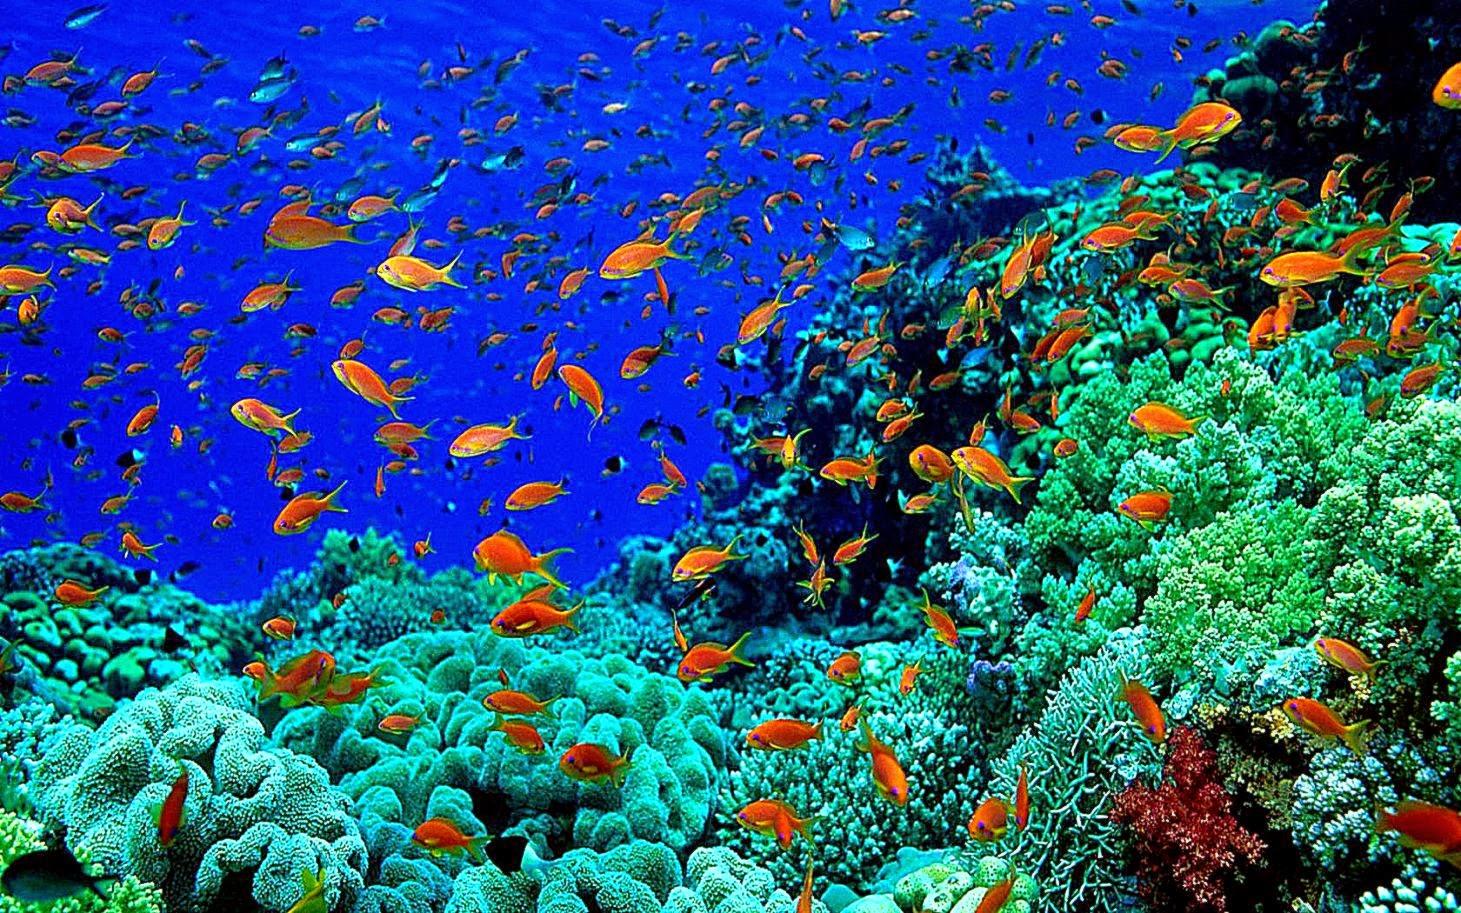 Beautiful Underwater Photography Wallpaper Wallpapers Gallery 1461x913